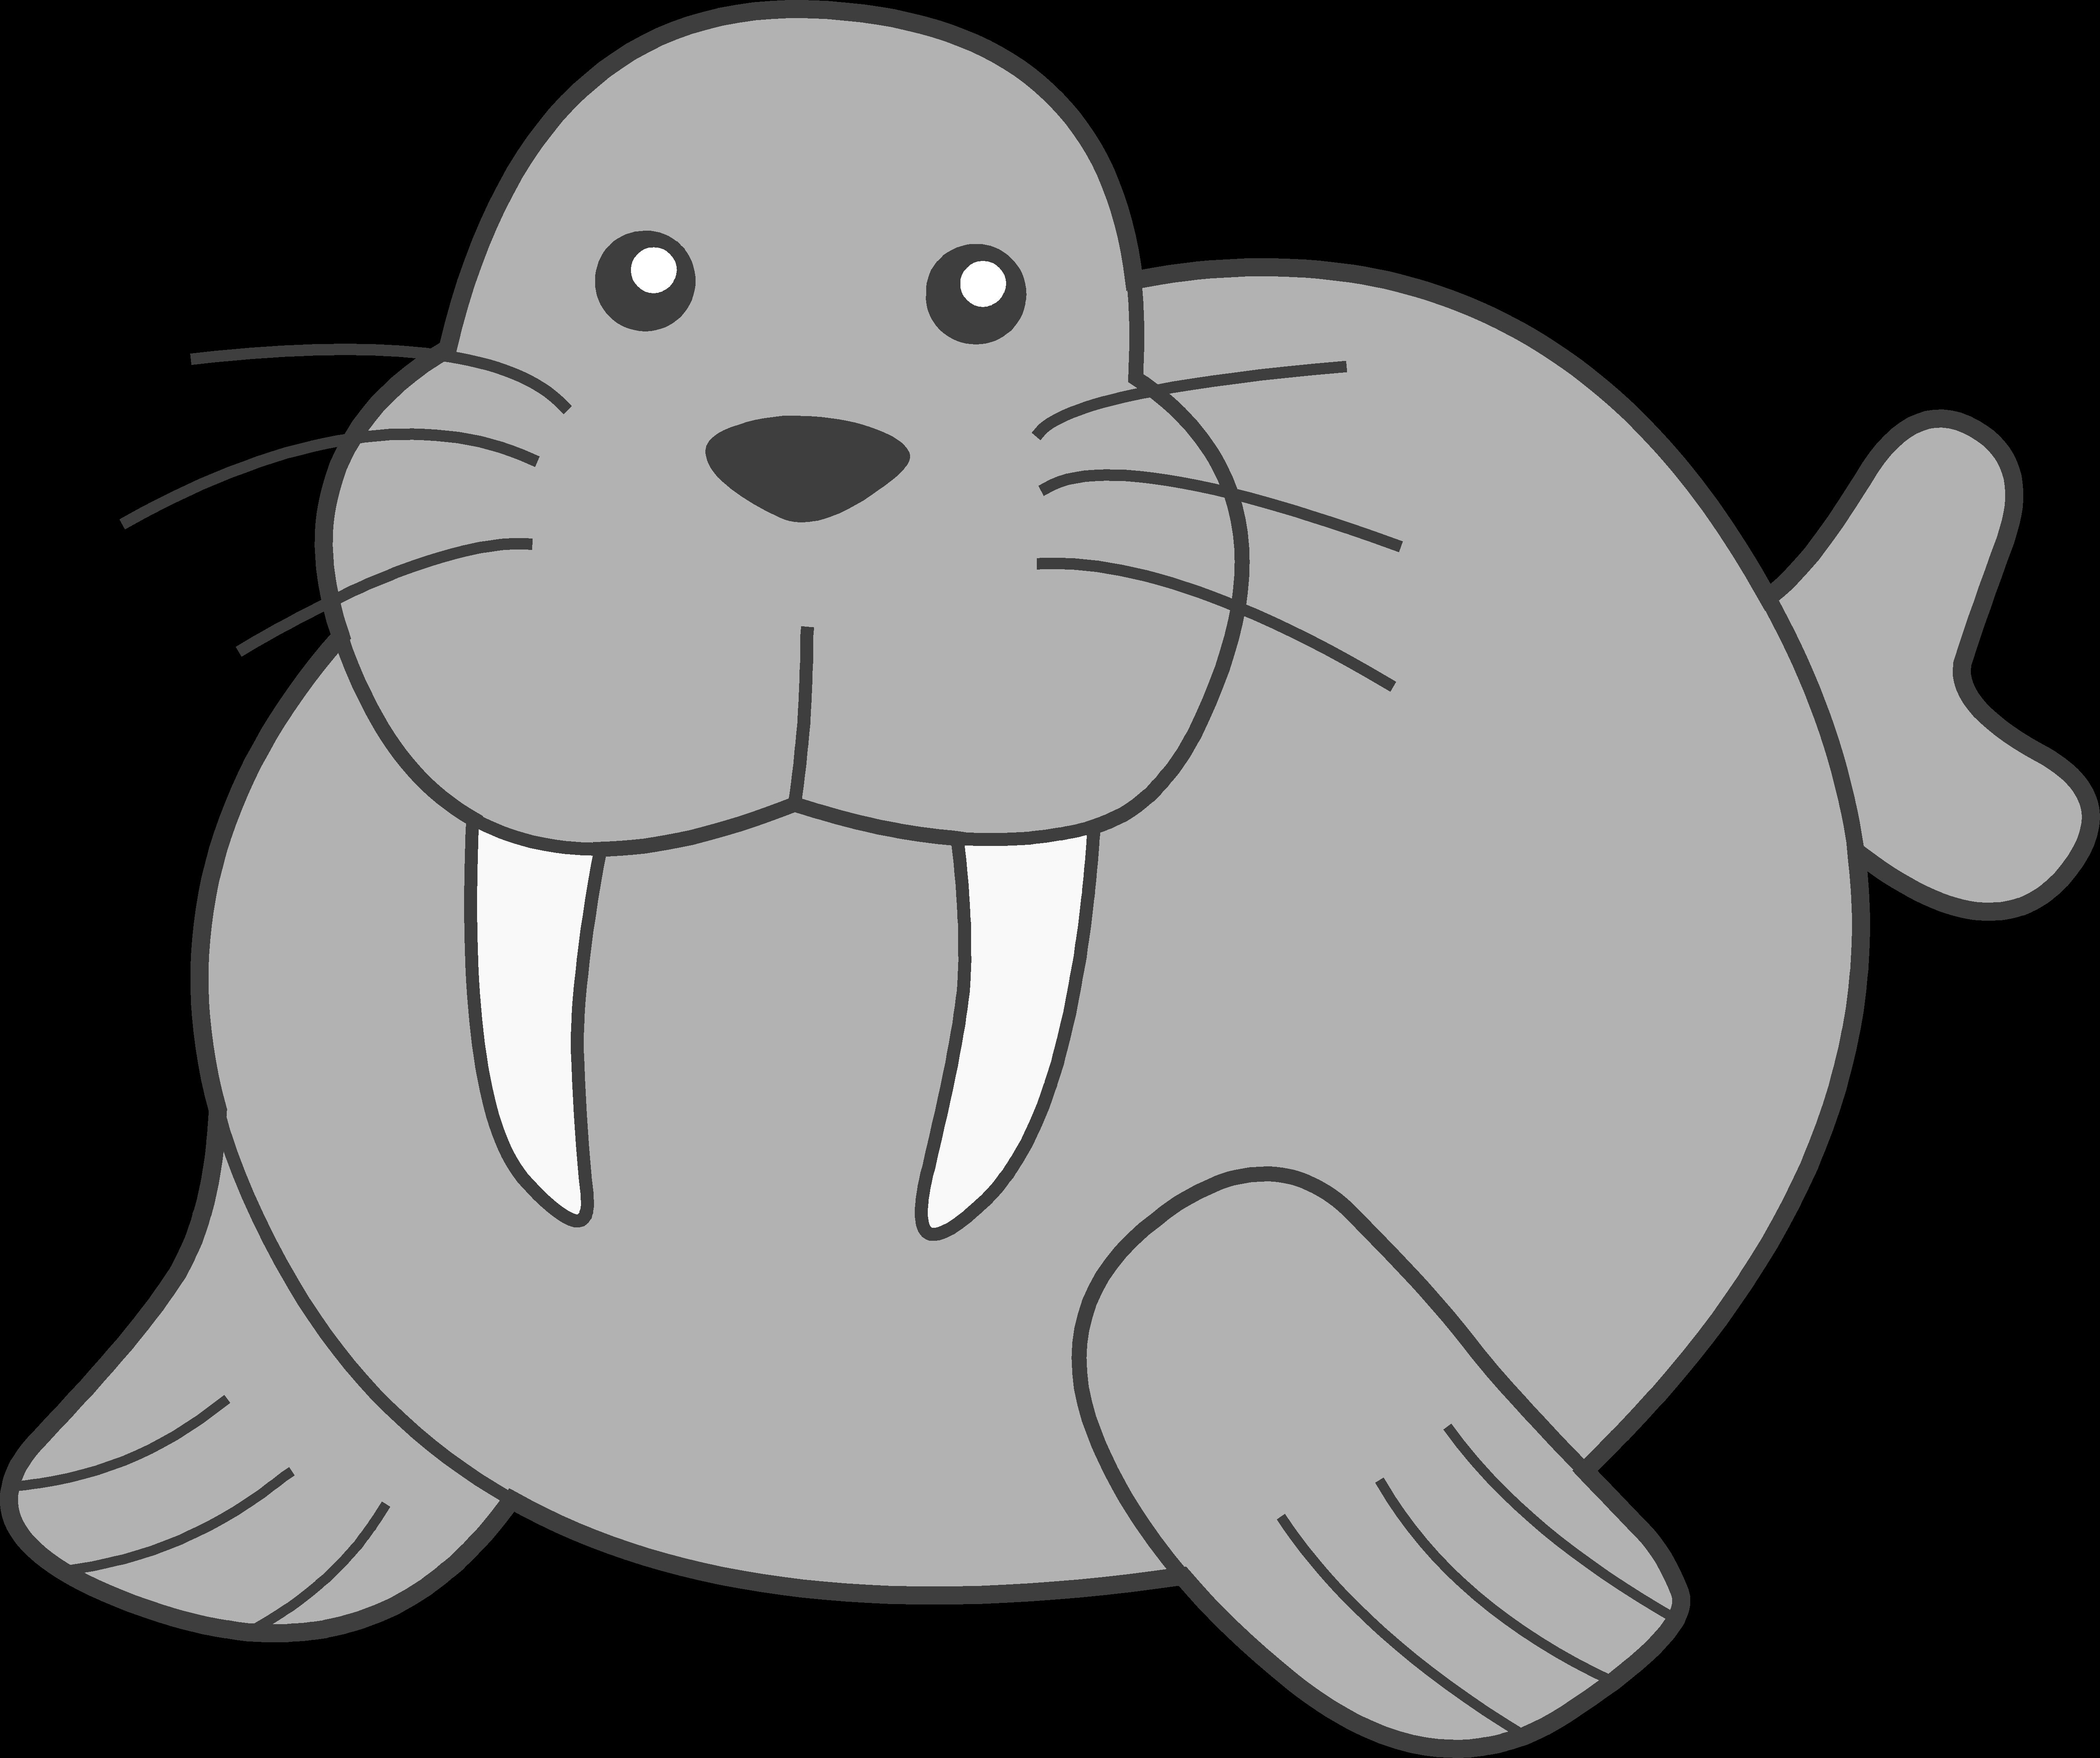 Free head cliparts download. Walrus clipart svg